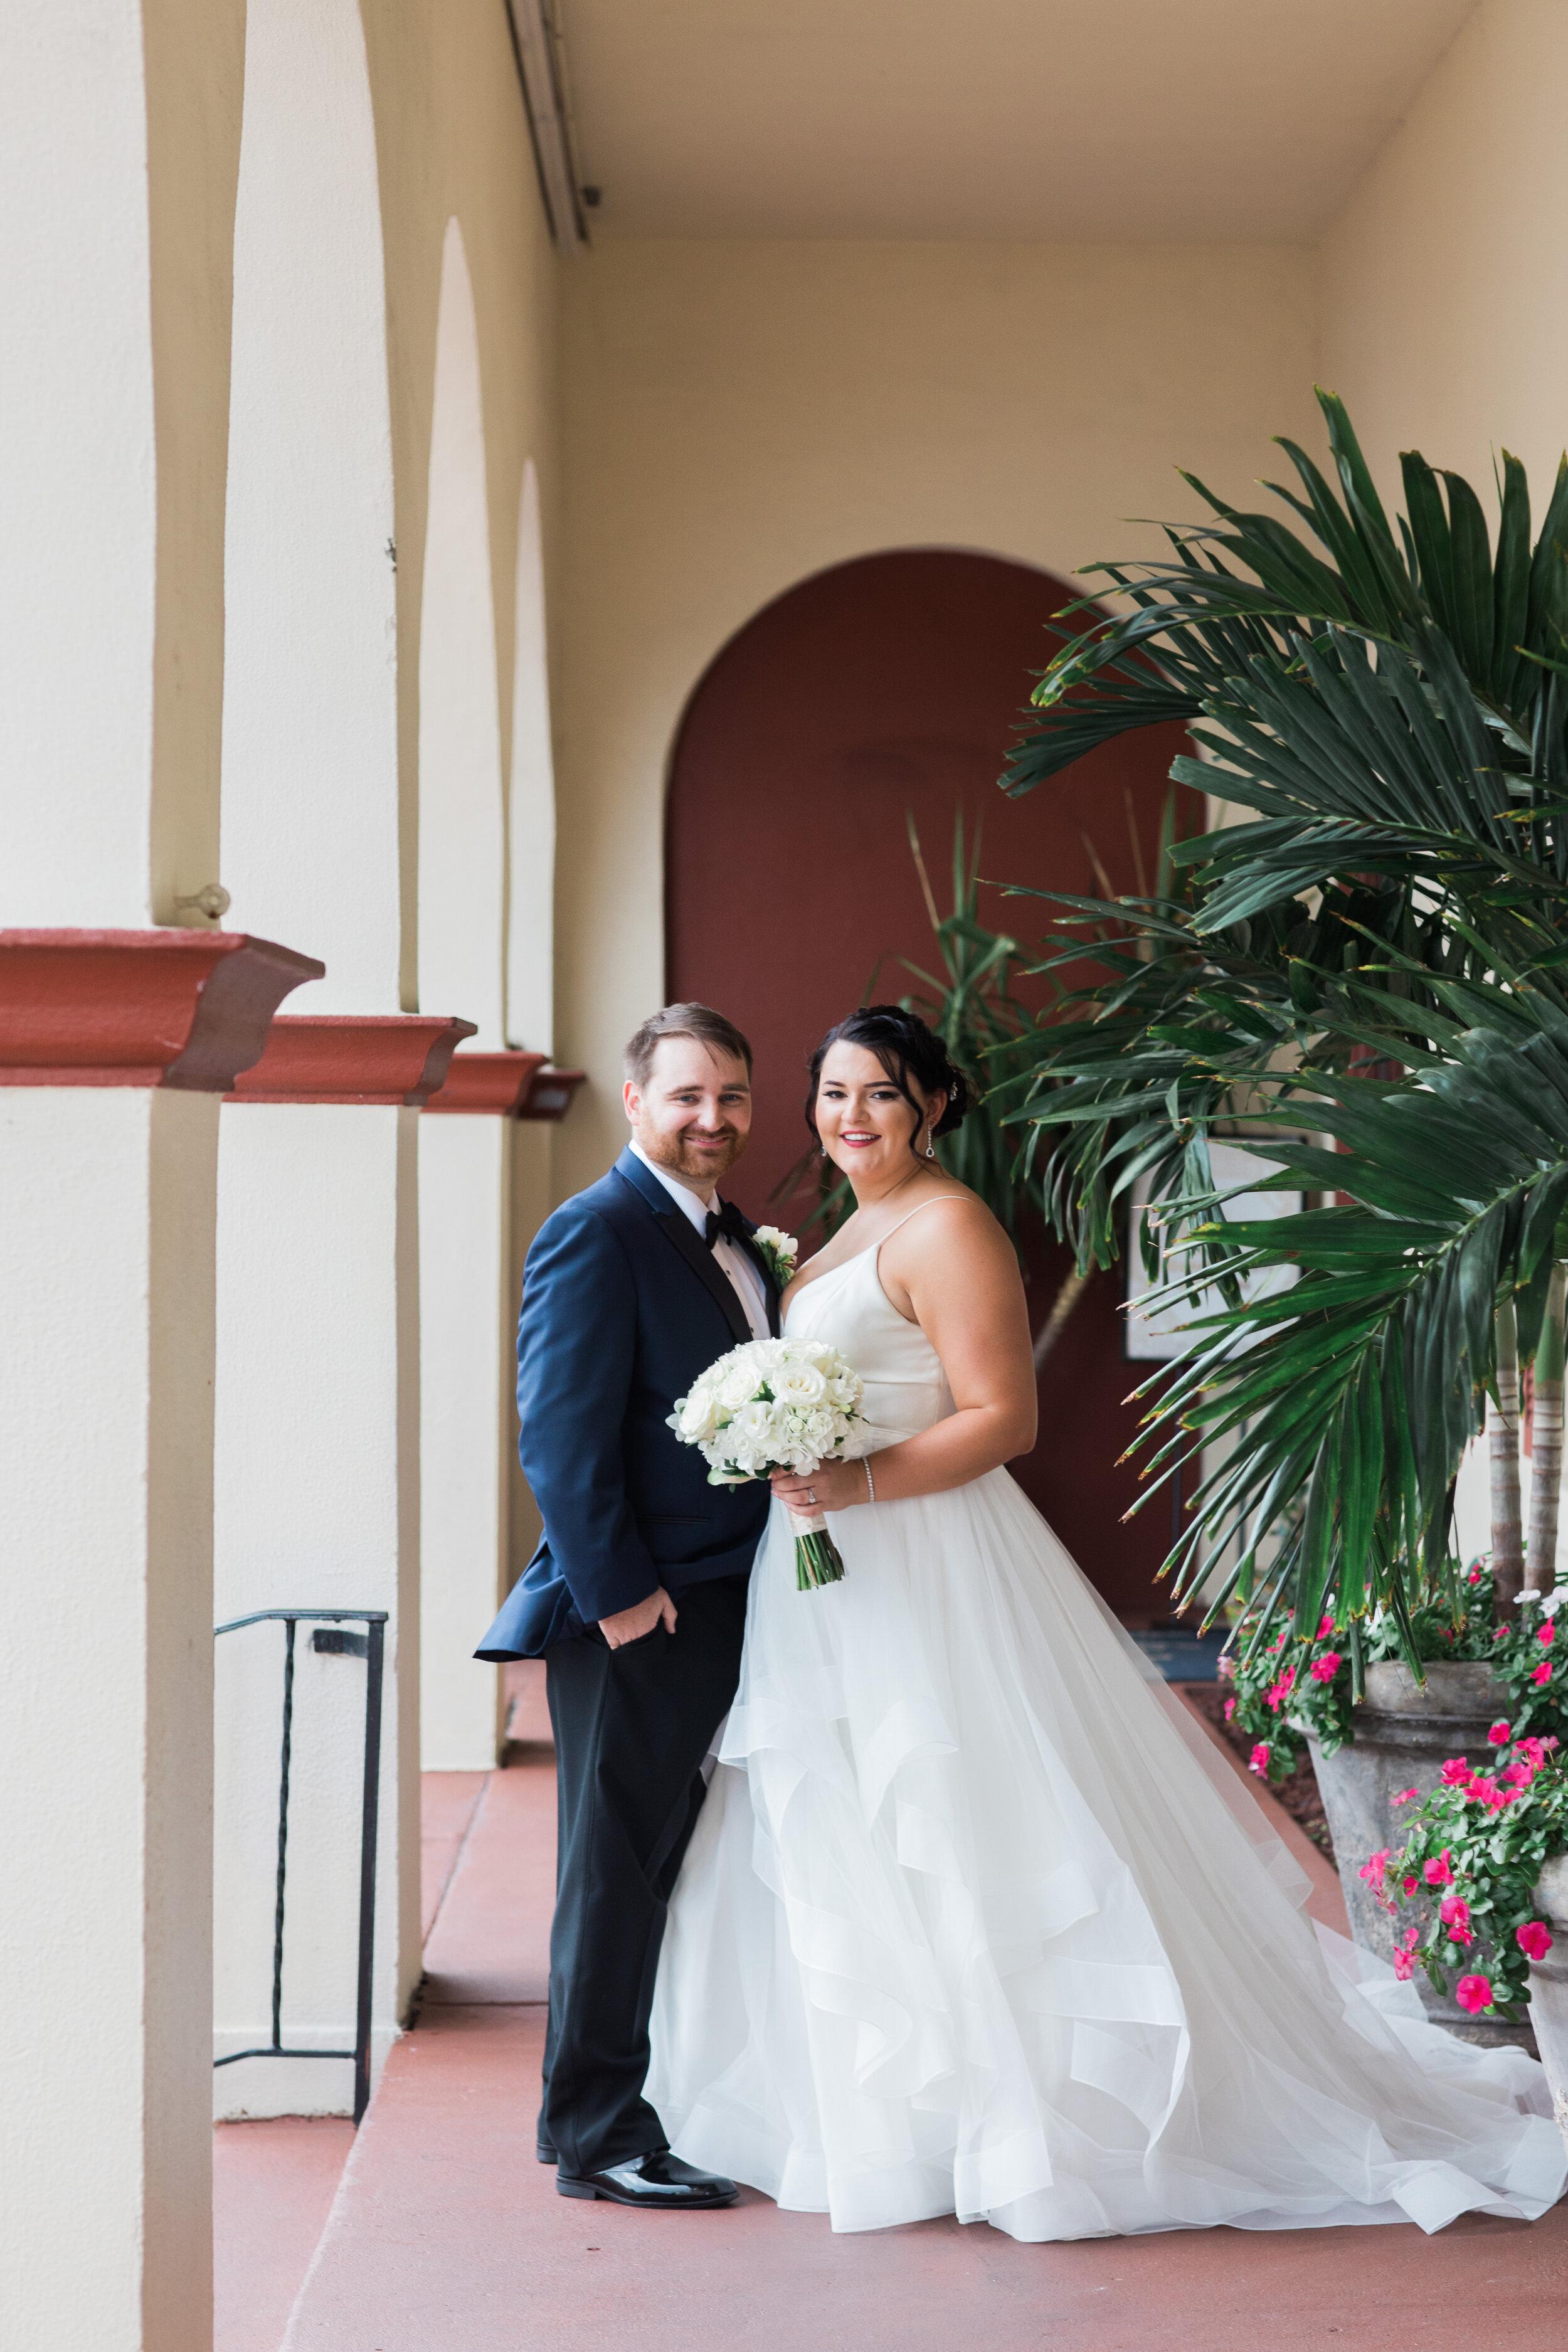 St_Augustine_Wedding_Photography_Treasury_on_the_Plaza_Wedding__0036_.jpg